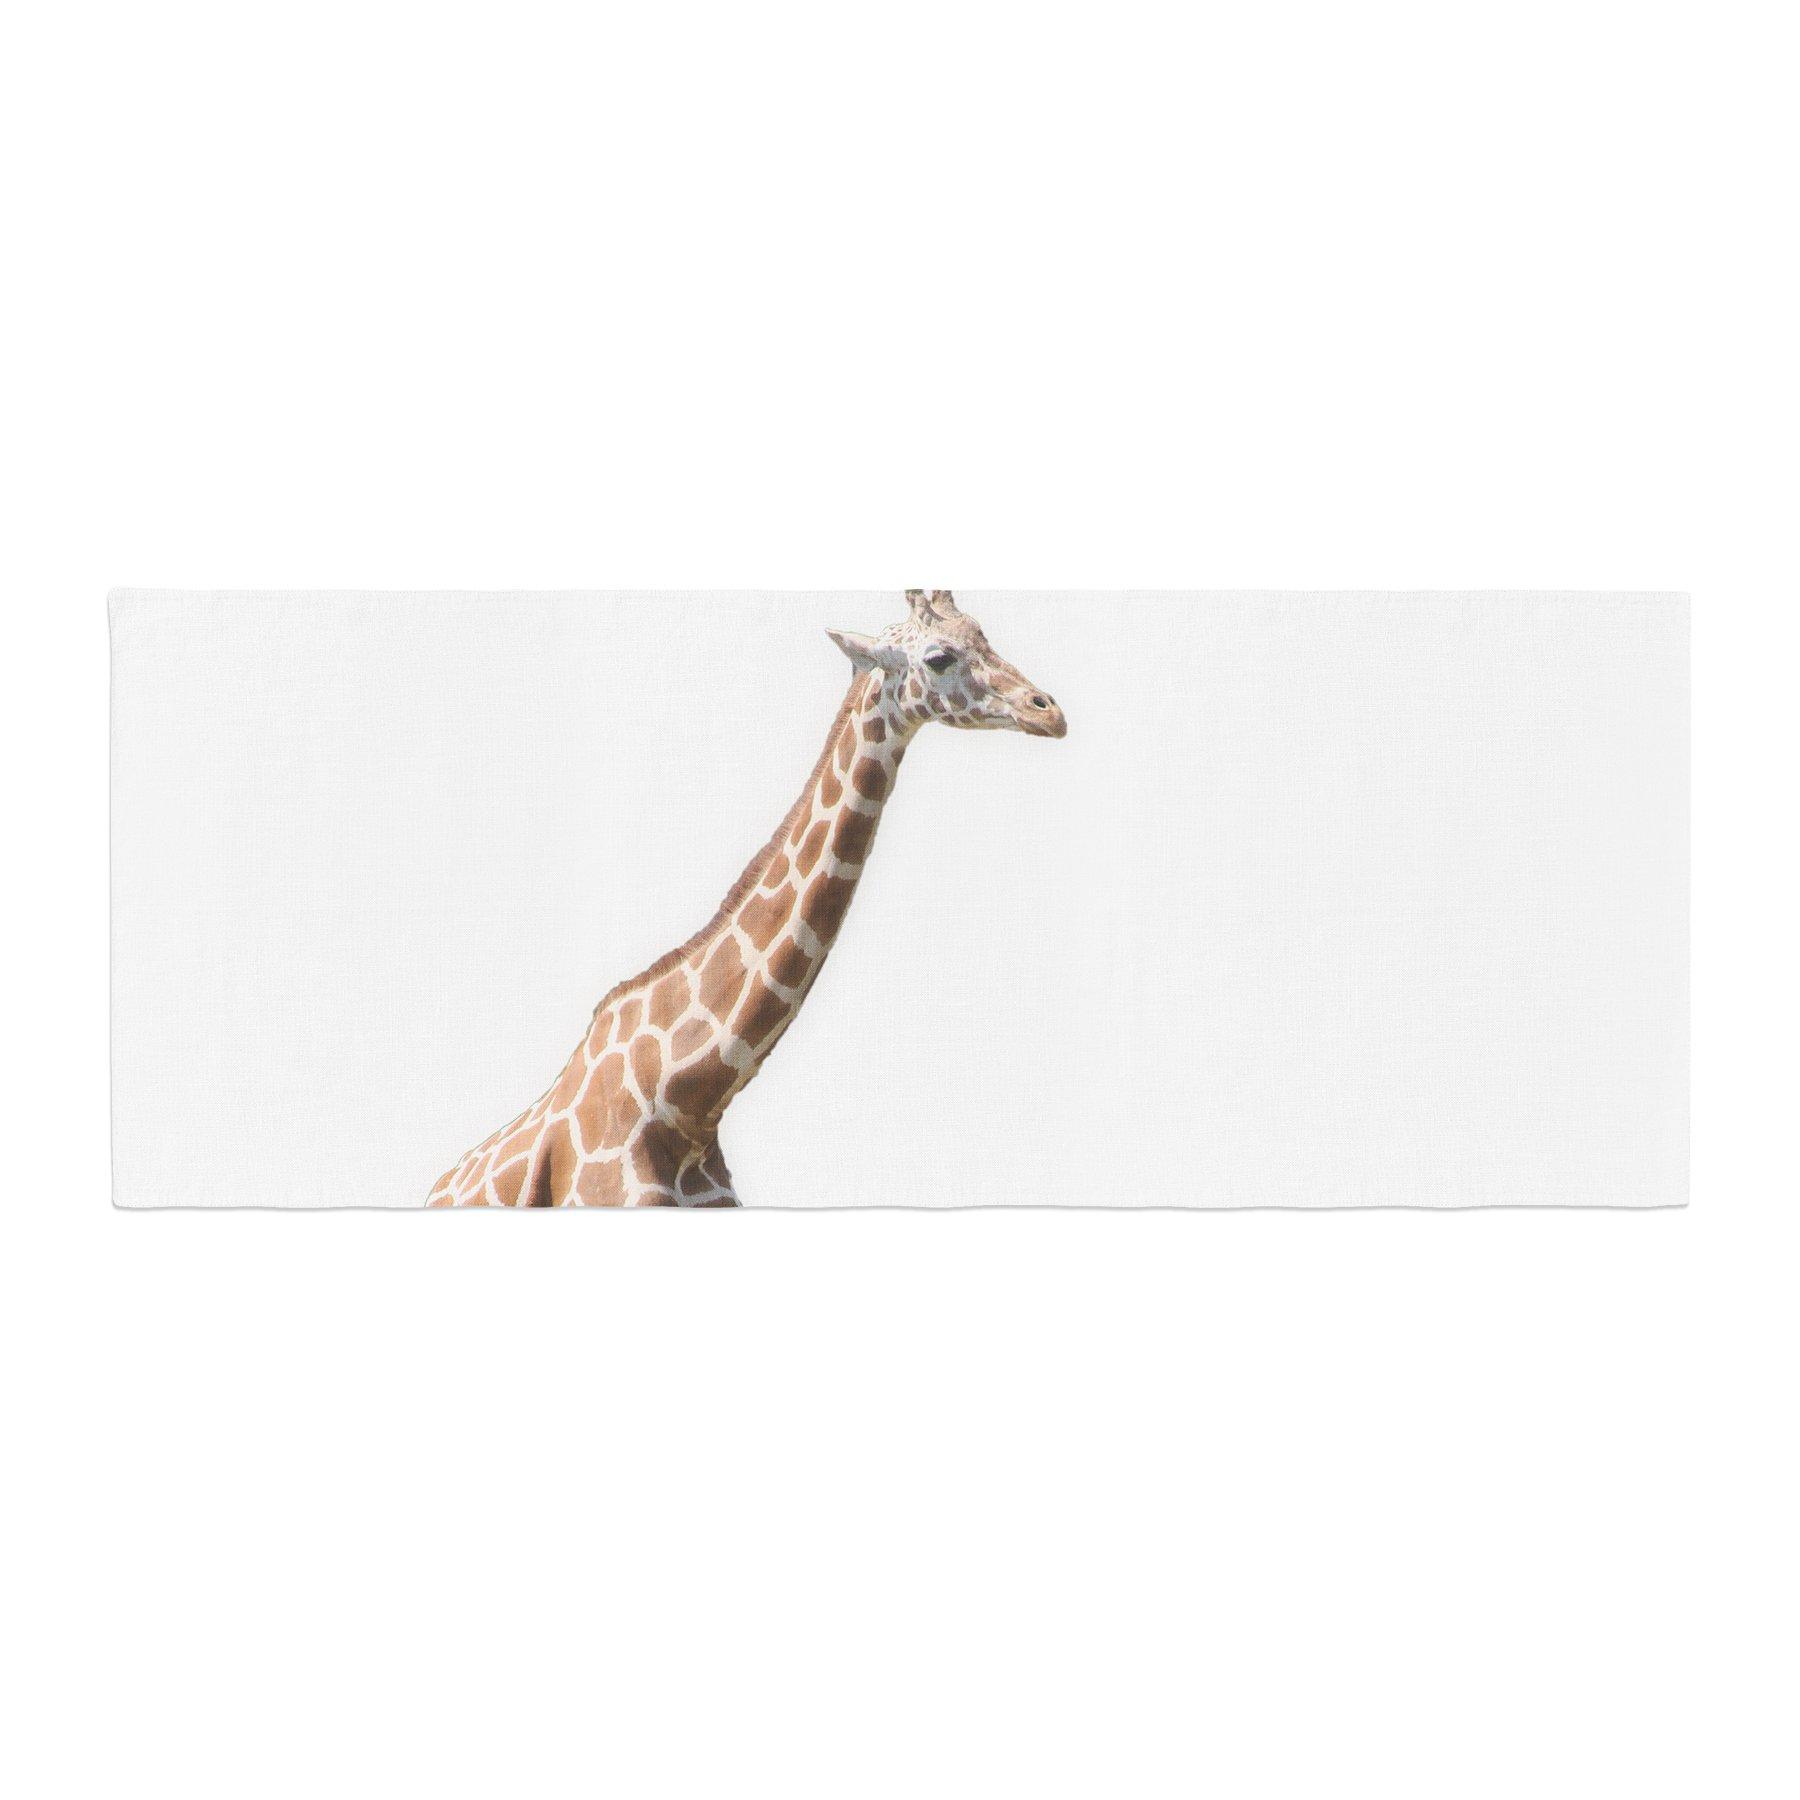 Kess InHouse Sylvia Coomes Giraffe Animals Photography Bed Runner, 34'' x 86''